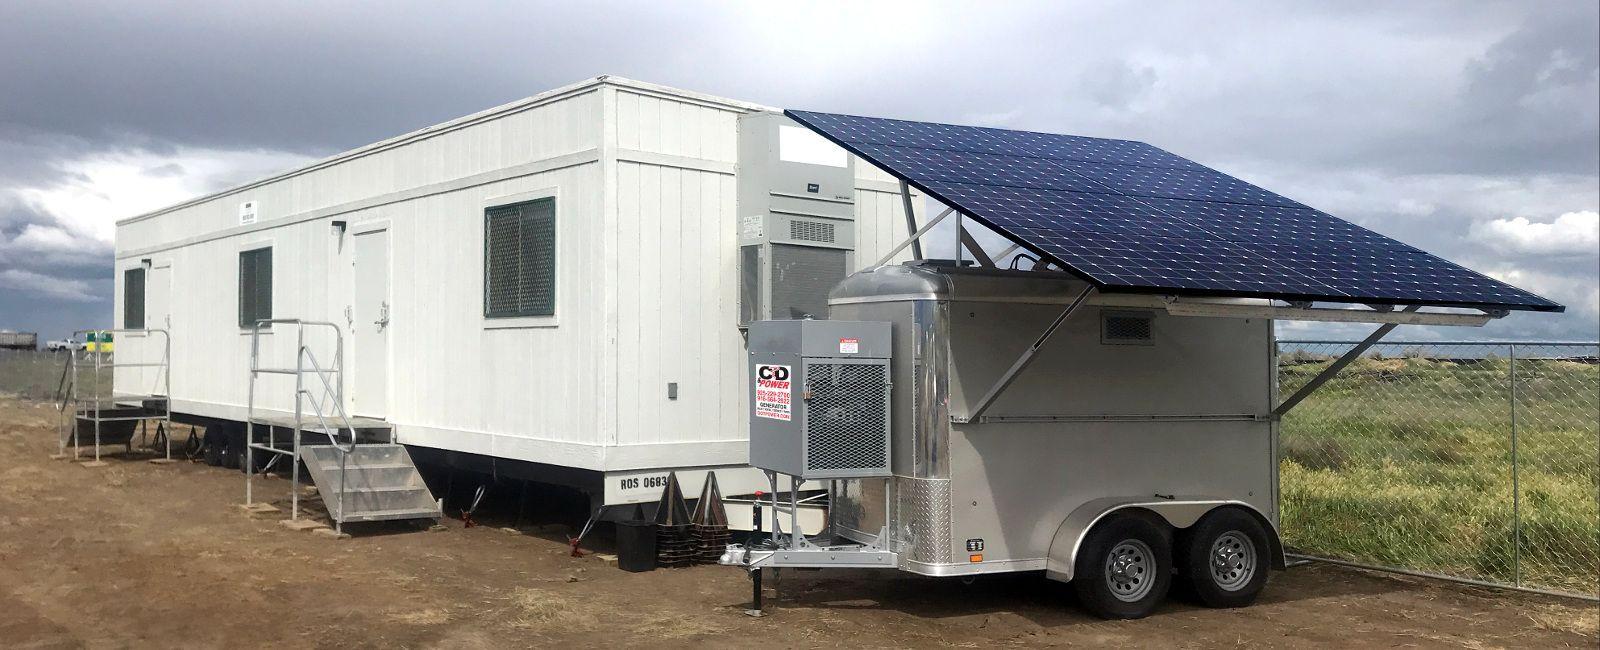 towable solar power